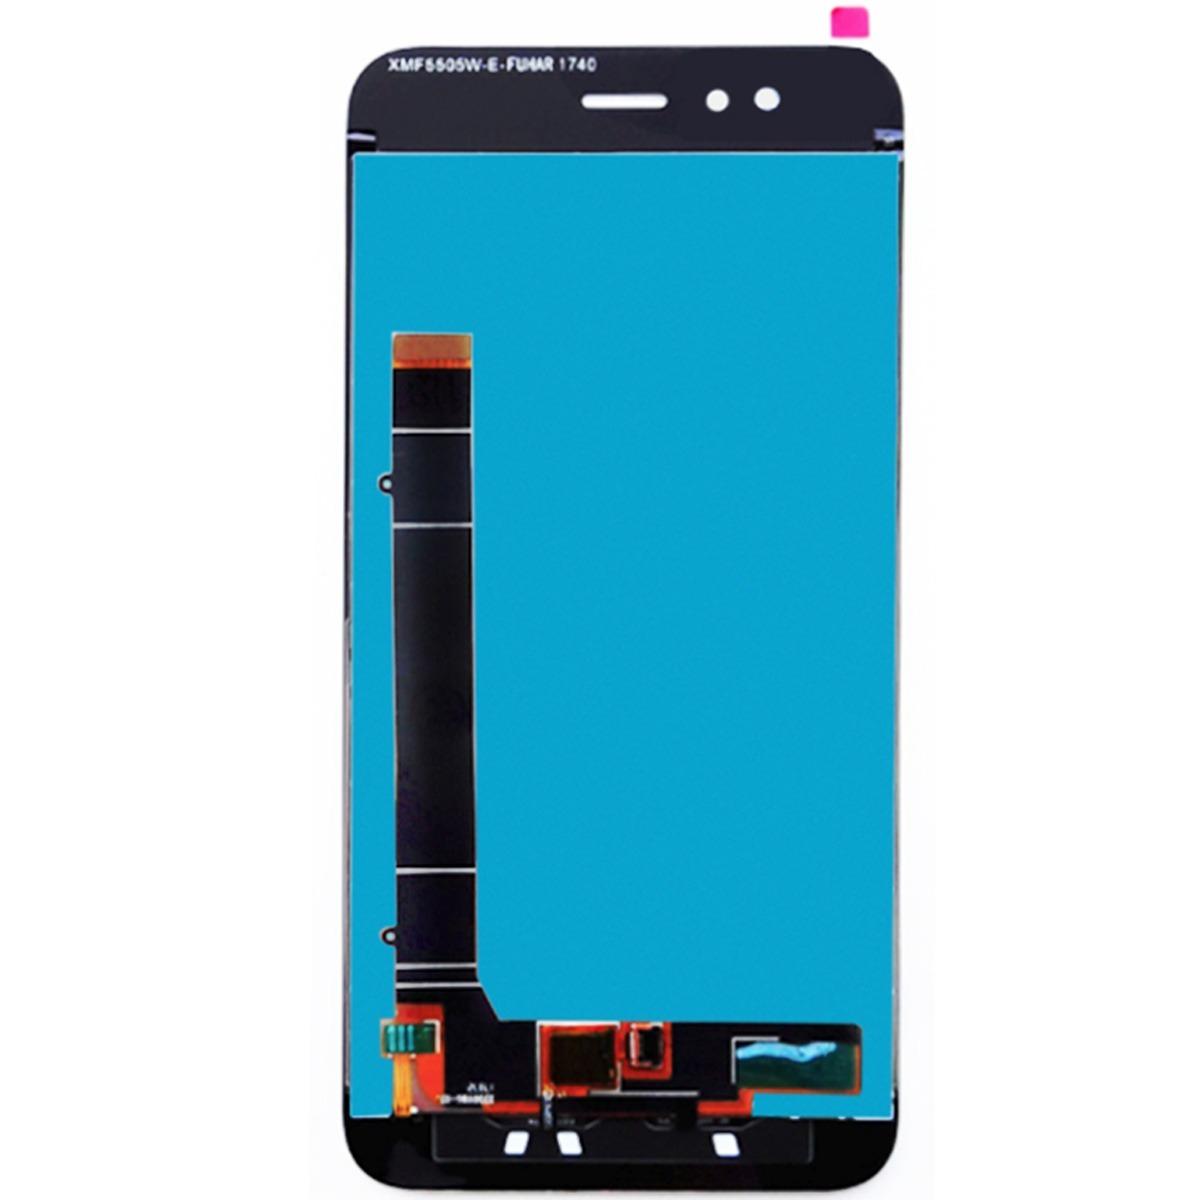 Tela Touch Display Lcd Xiaomi Mi A1 Mia1 5x Original R 9999 Touchscreen Mi5x Carregando Zoom